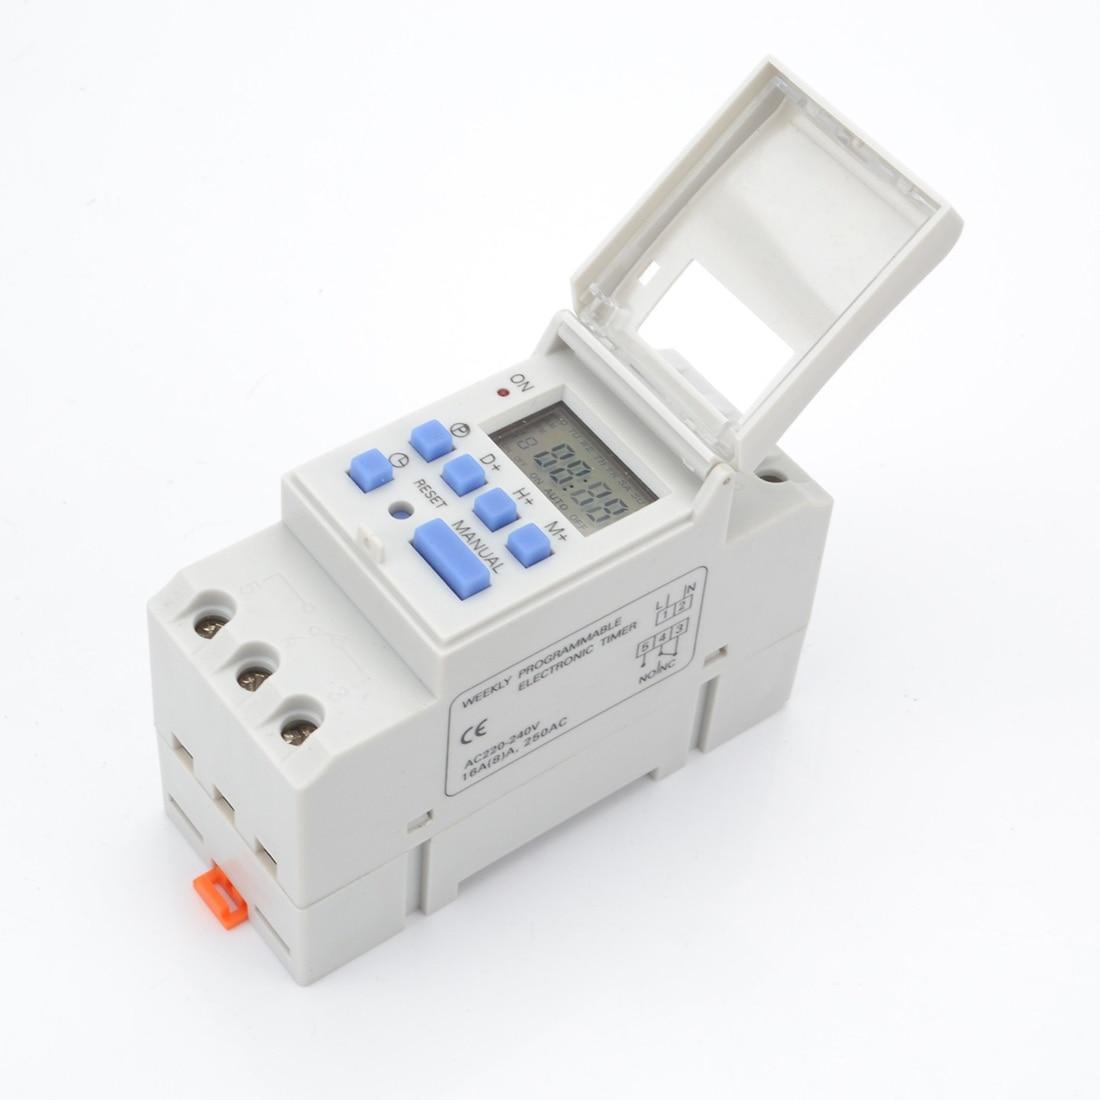 AC 220 v Digitale LCD Power Timer Programmierbare Zeit Schalter Relais 16A temporizador Din Schiene